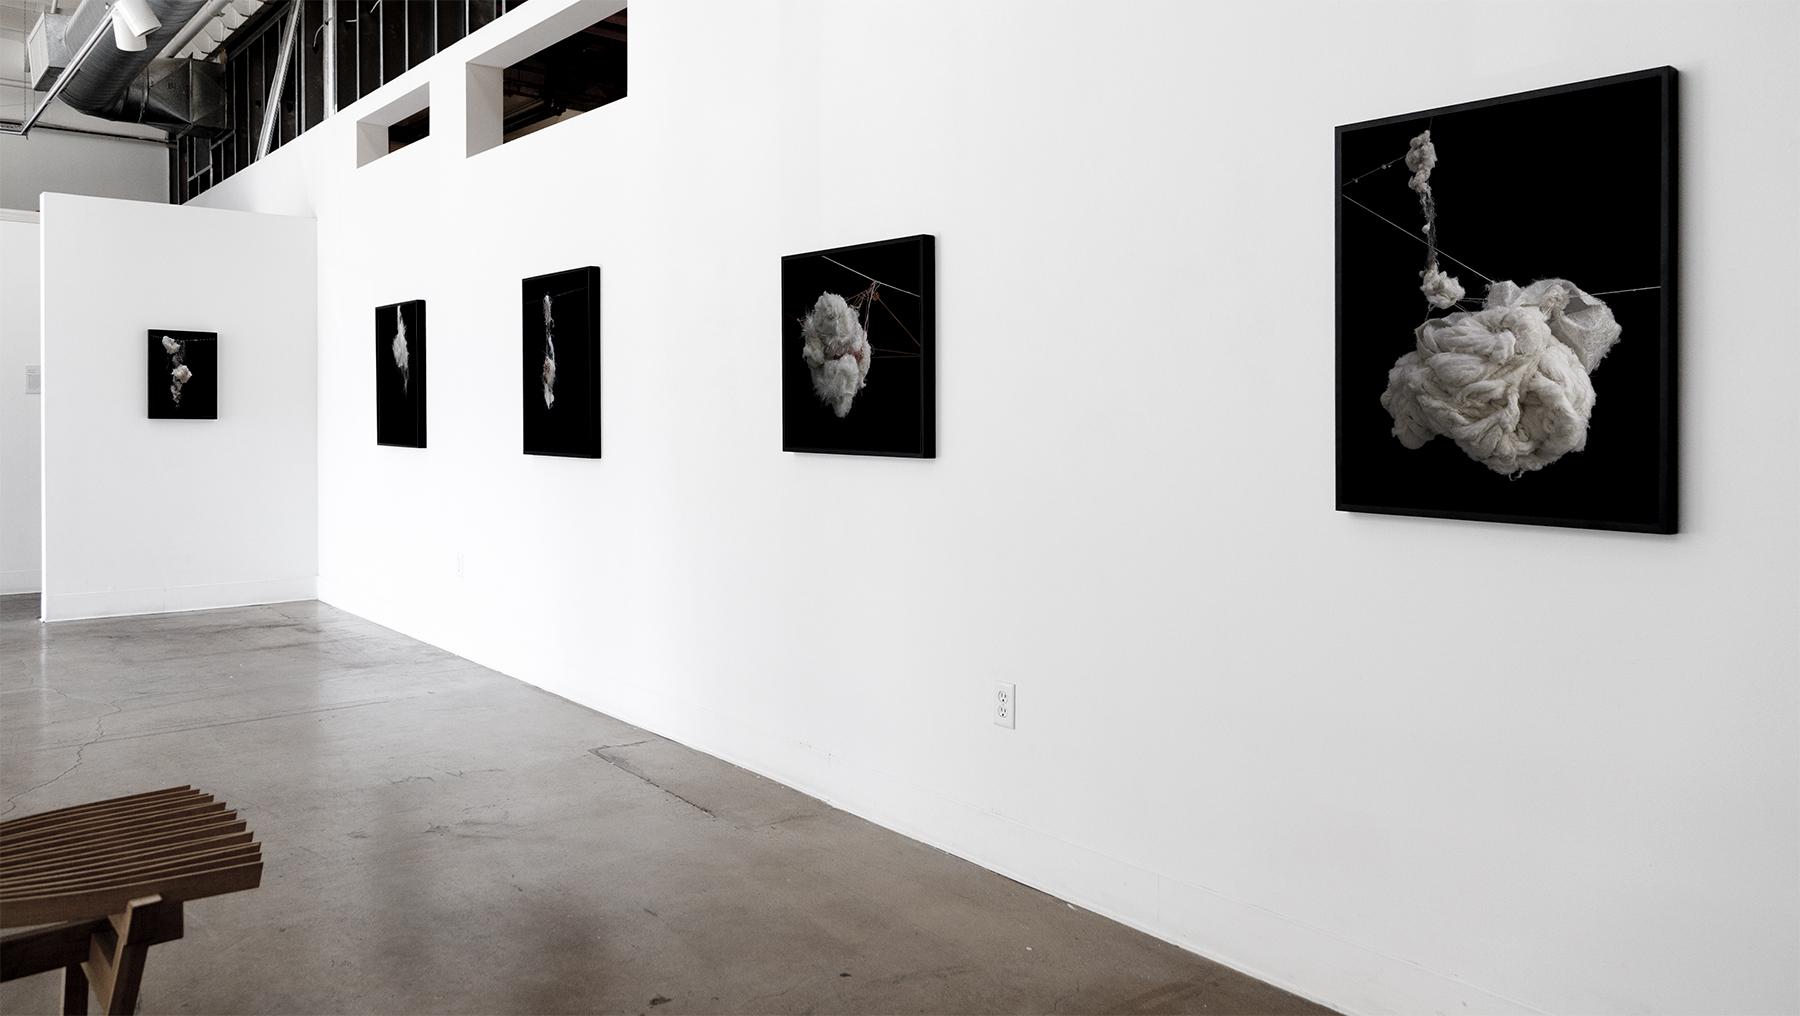 In the Space Between @ Swarm Gallery 2012